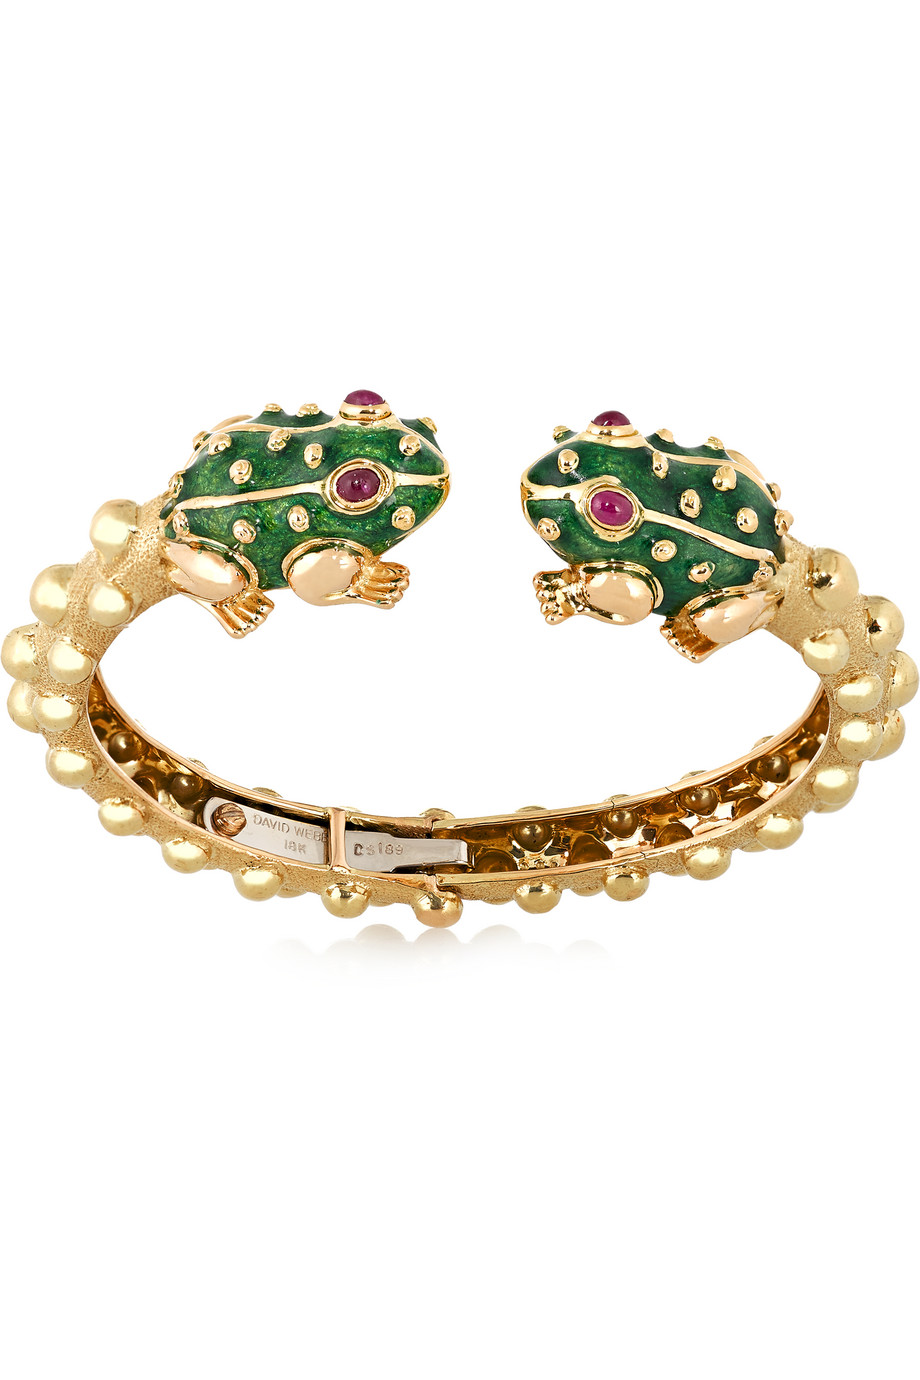 David Webb Baby Frog 18-Karat Gold, Ruby and Enamel Bracelet, Gold/Green, Women's